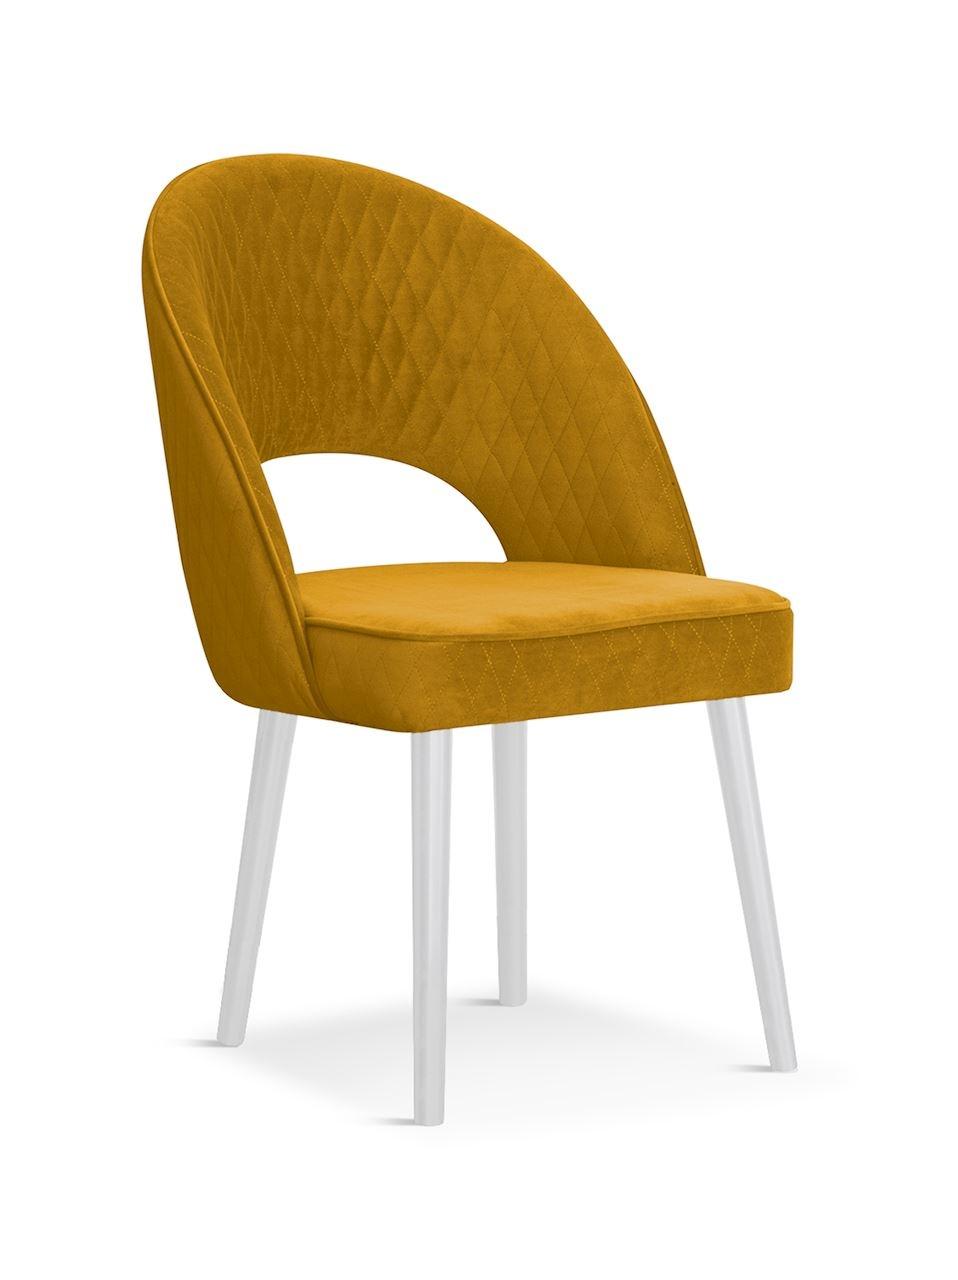 Scaun tapitat cu stofa, cu picioare din lemn Ponte Honey / White, l56xA63xH89 cm